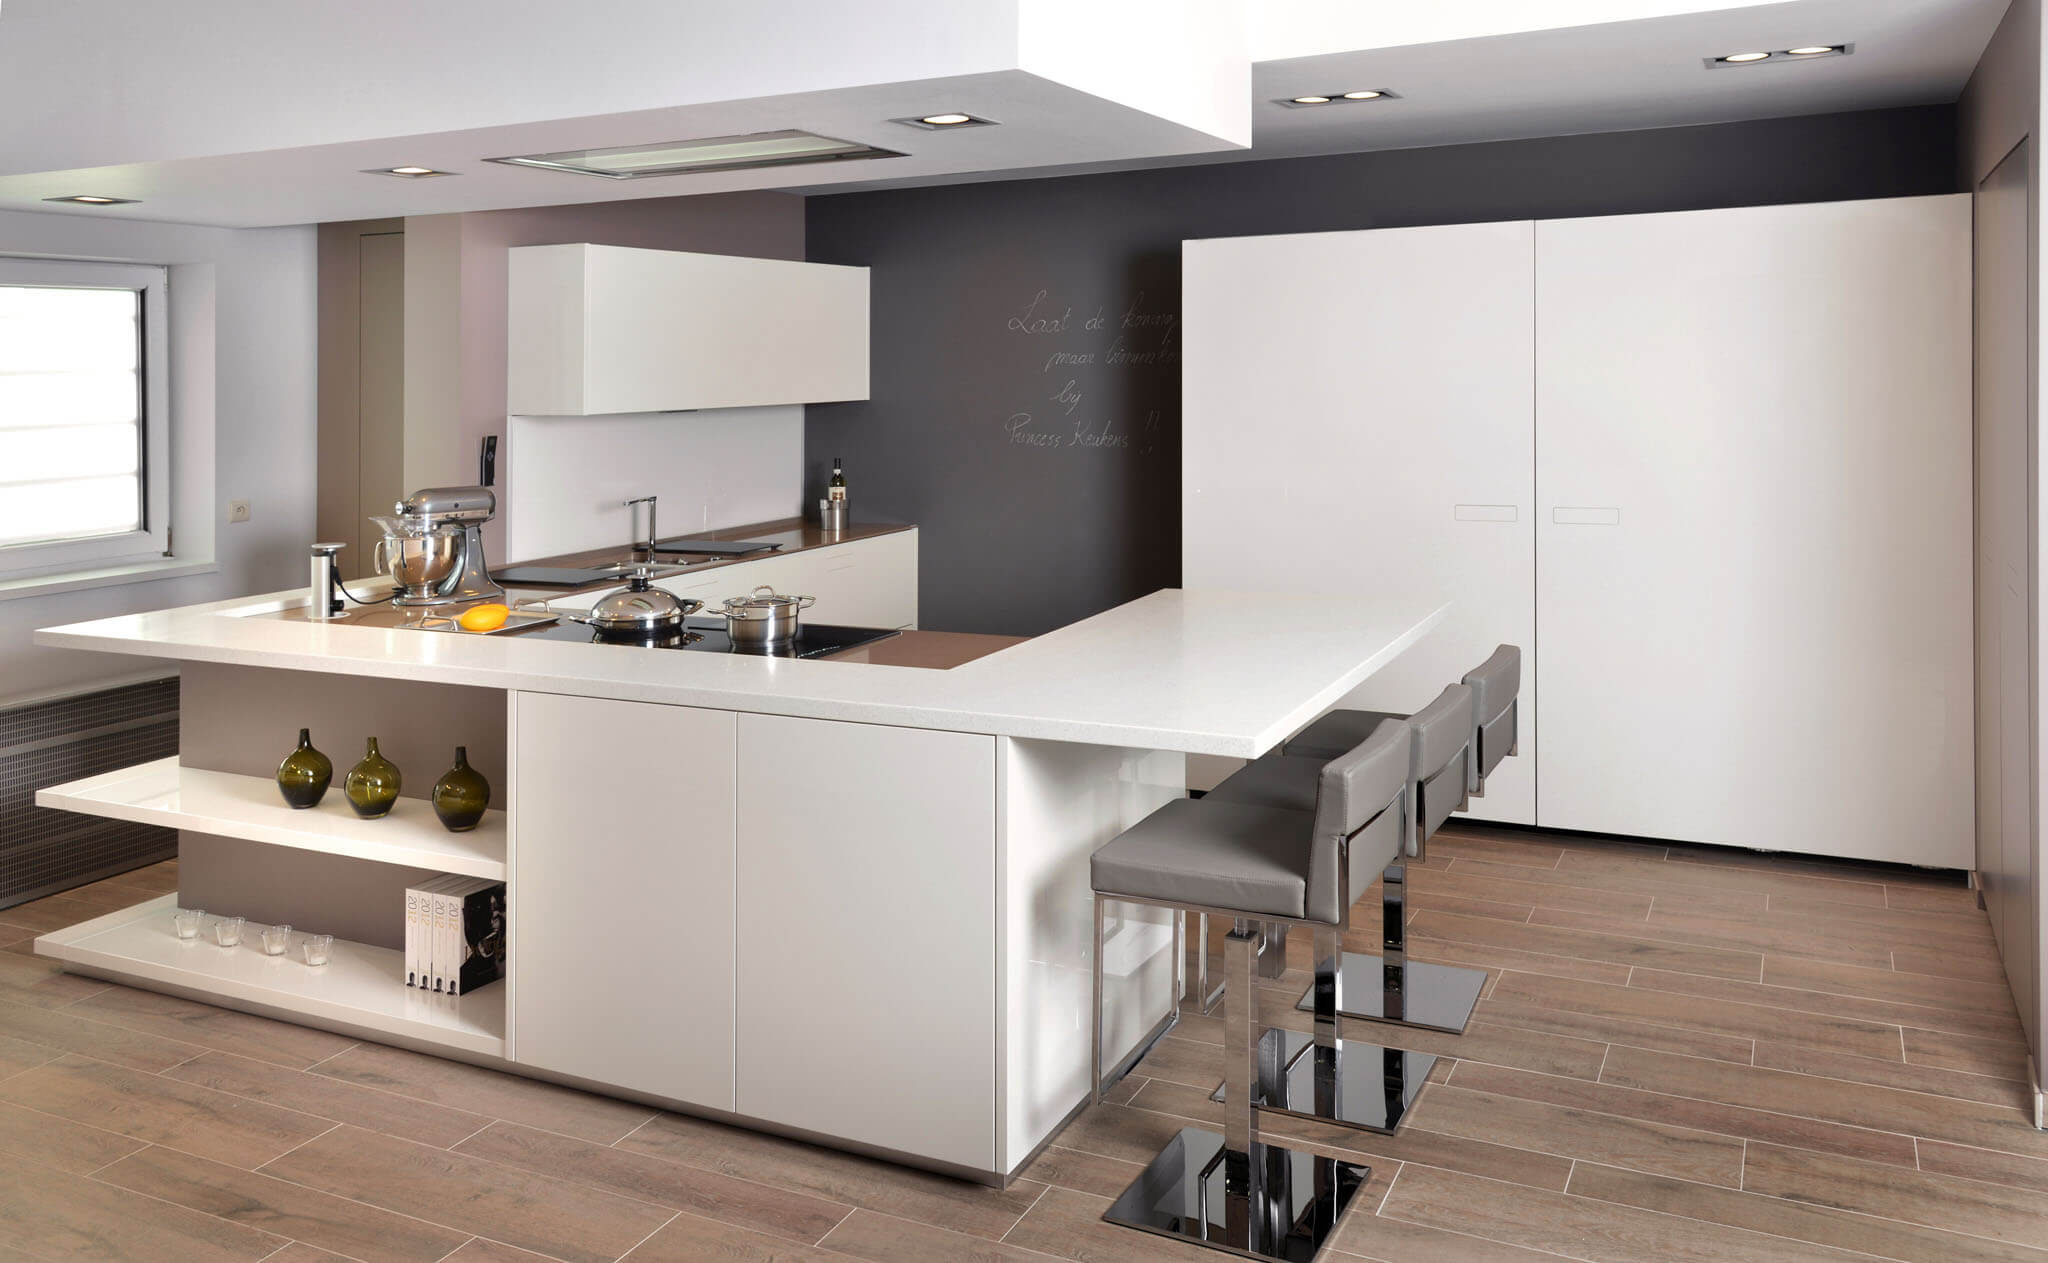 Keuken volledige verkoop brugman keukens badkamers ervaringen